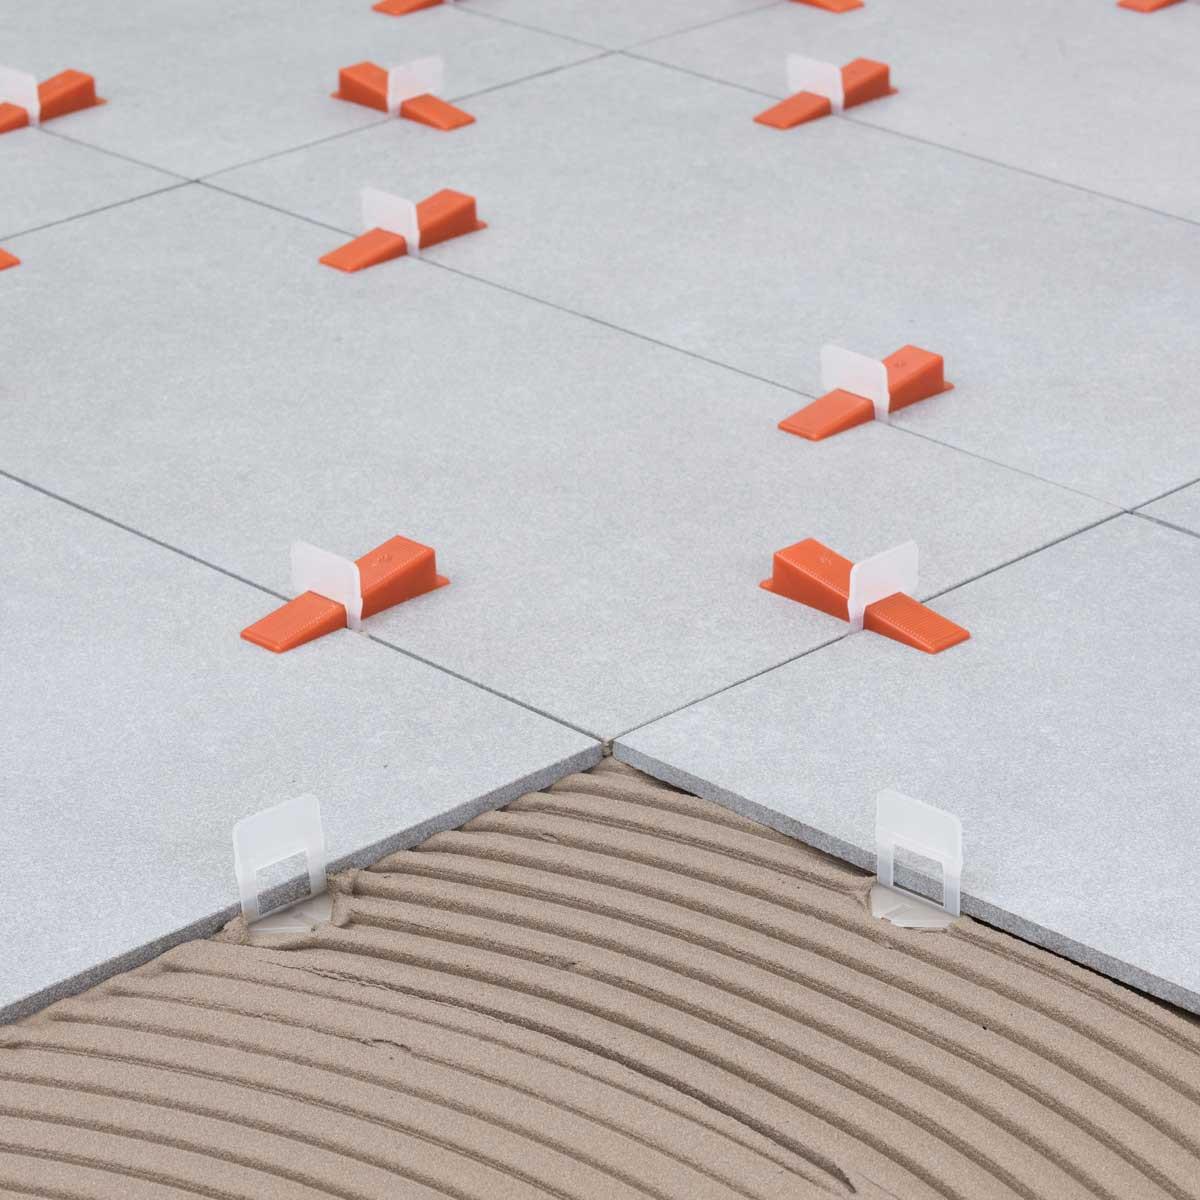 raimondi RLS floor leveling wedges and clips stone tile